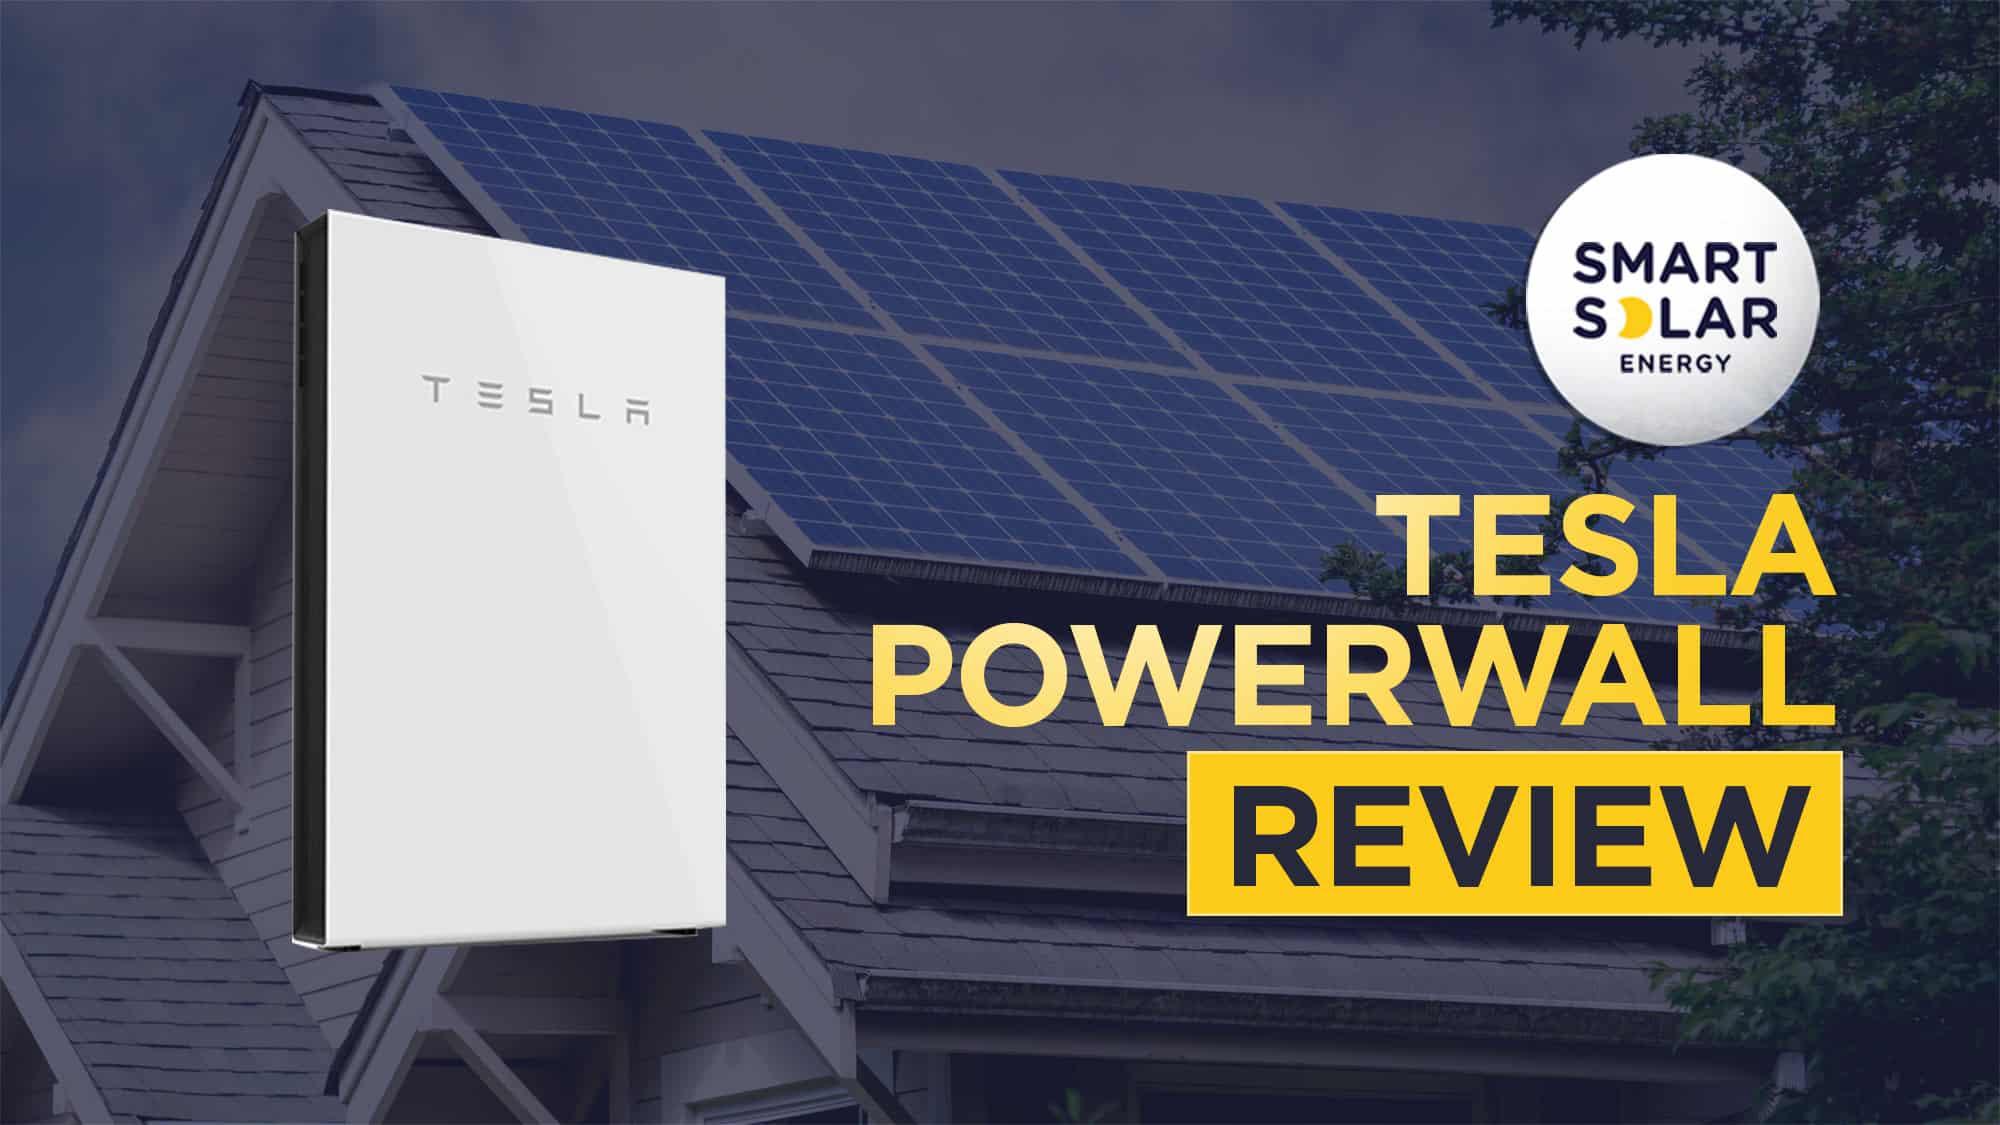 Tesla Powerwall review